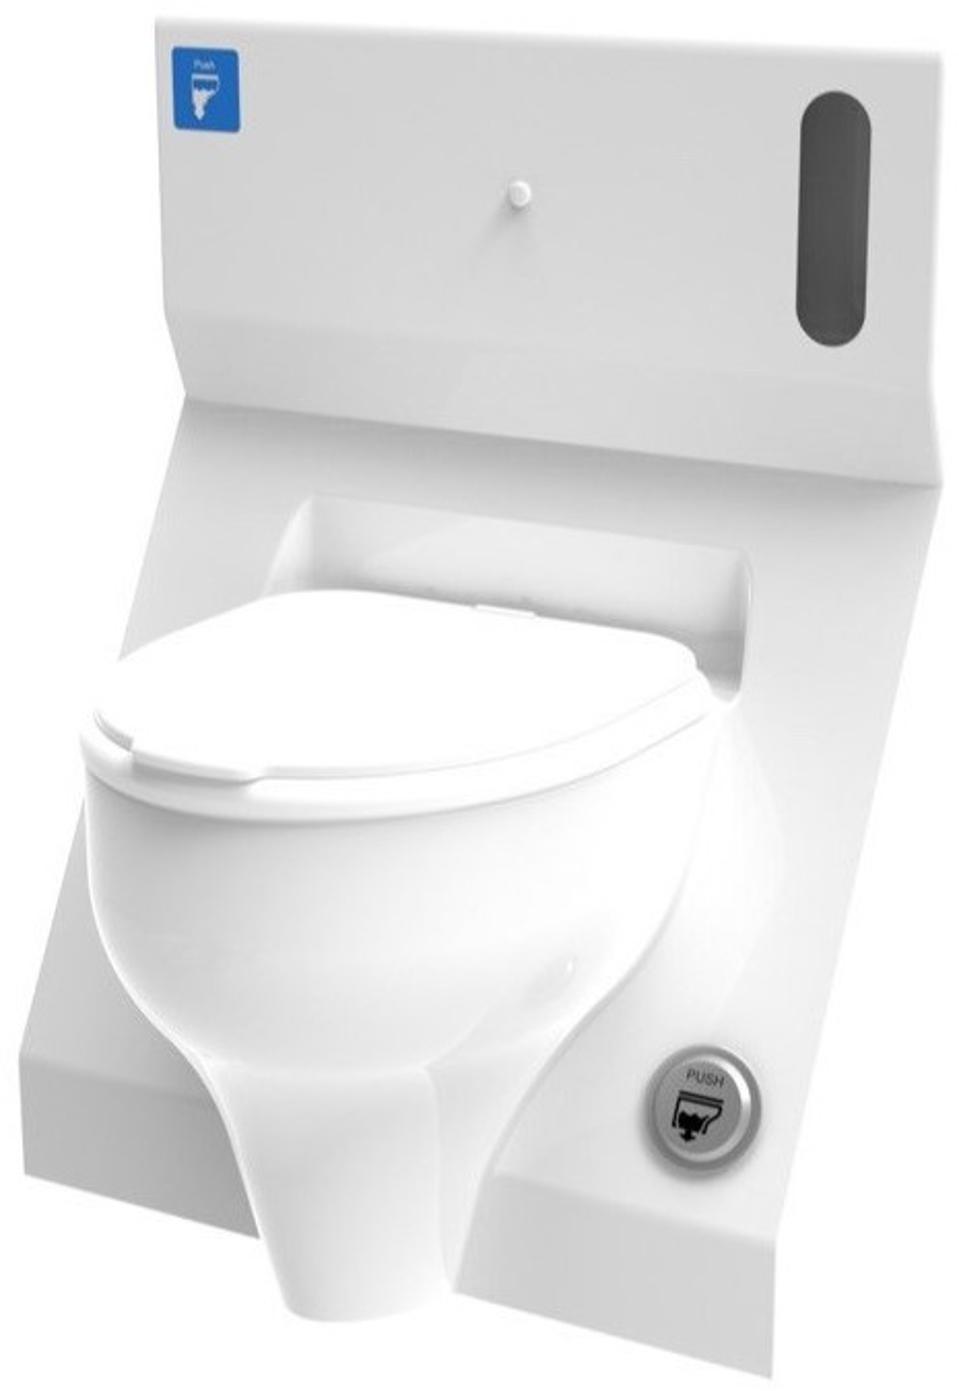 Toilet with flush button